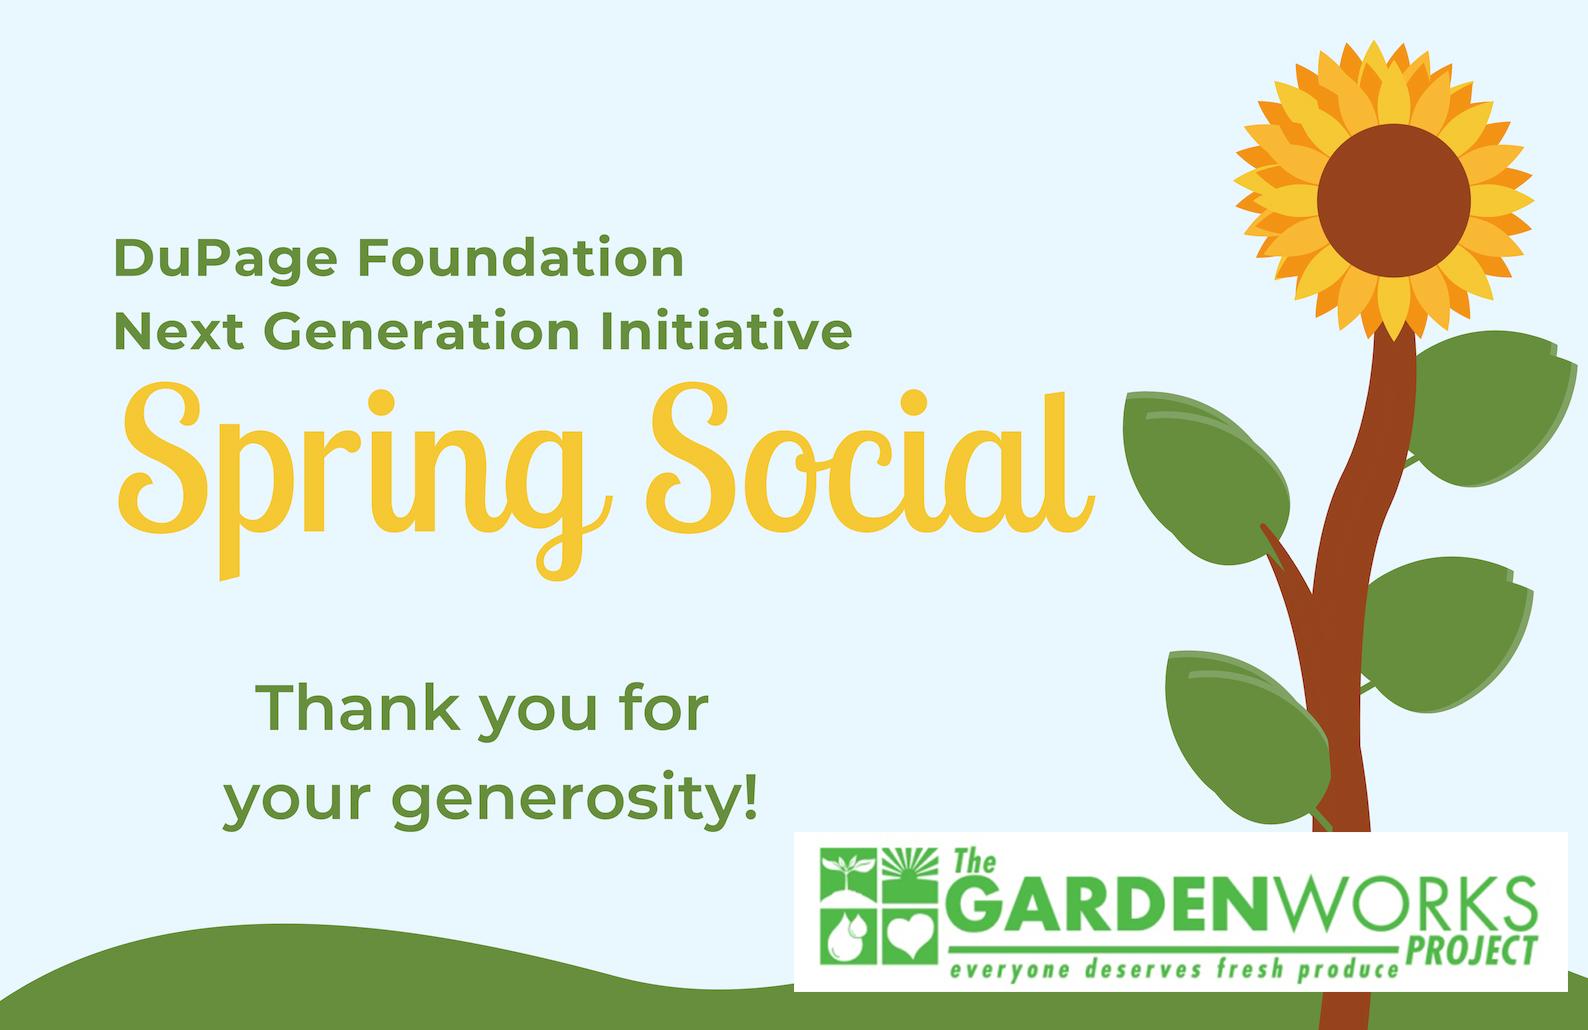 NGI Spring Social Grows Support for GardenWorks